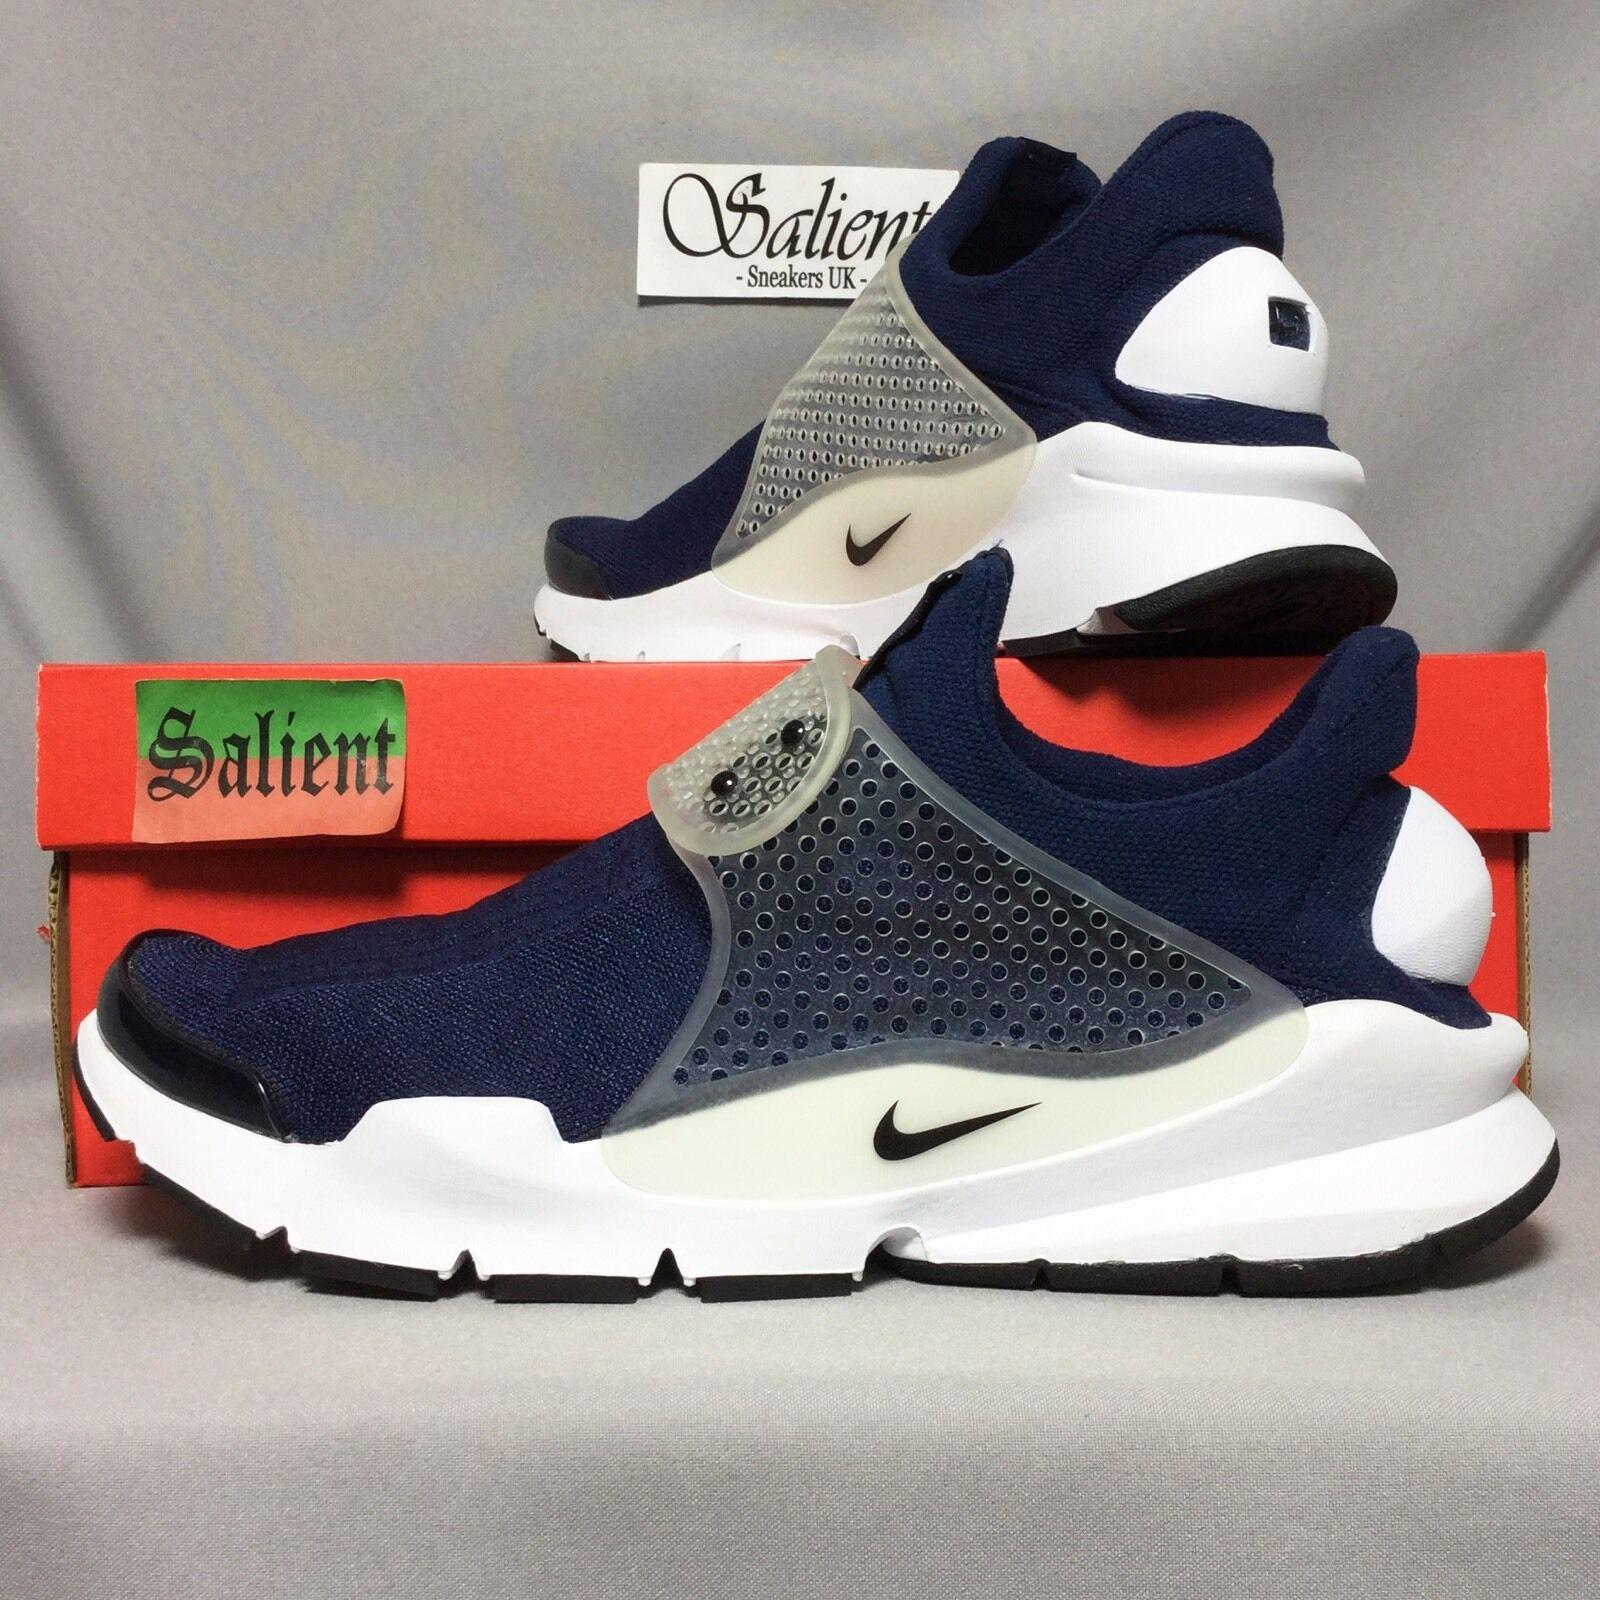 Nike sock dardo uk11 819686-400 marina eur46 us12 ds qs presto moc acg / flusso d'aria